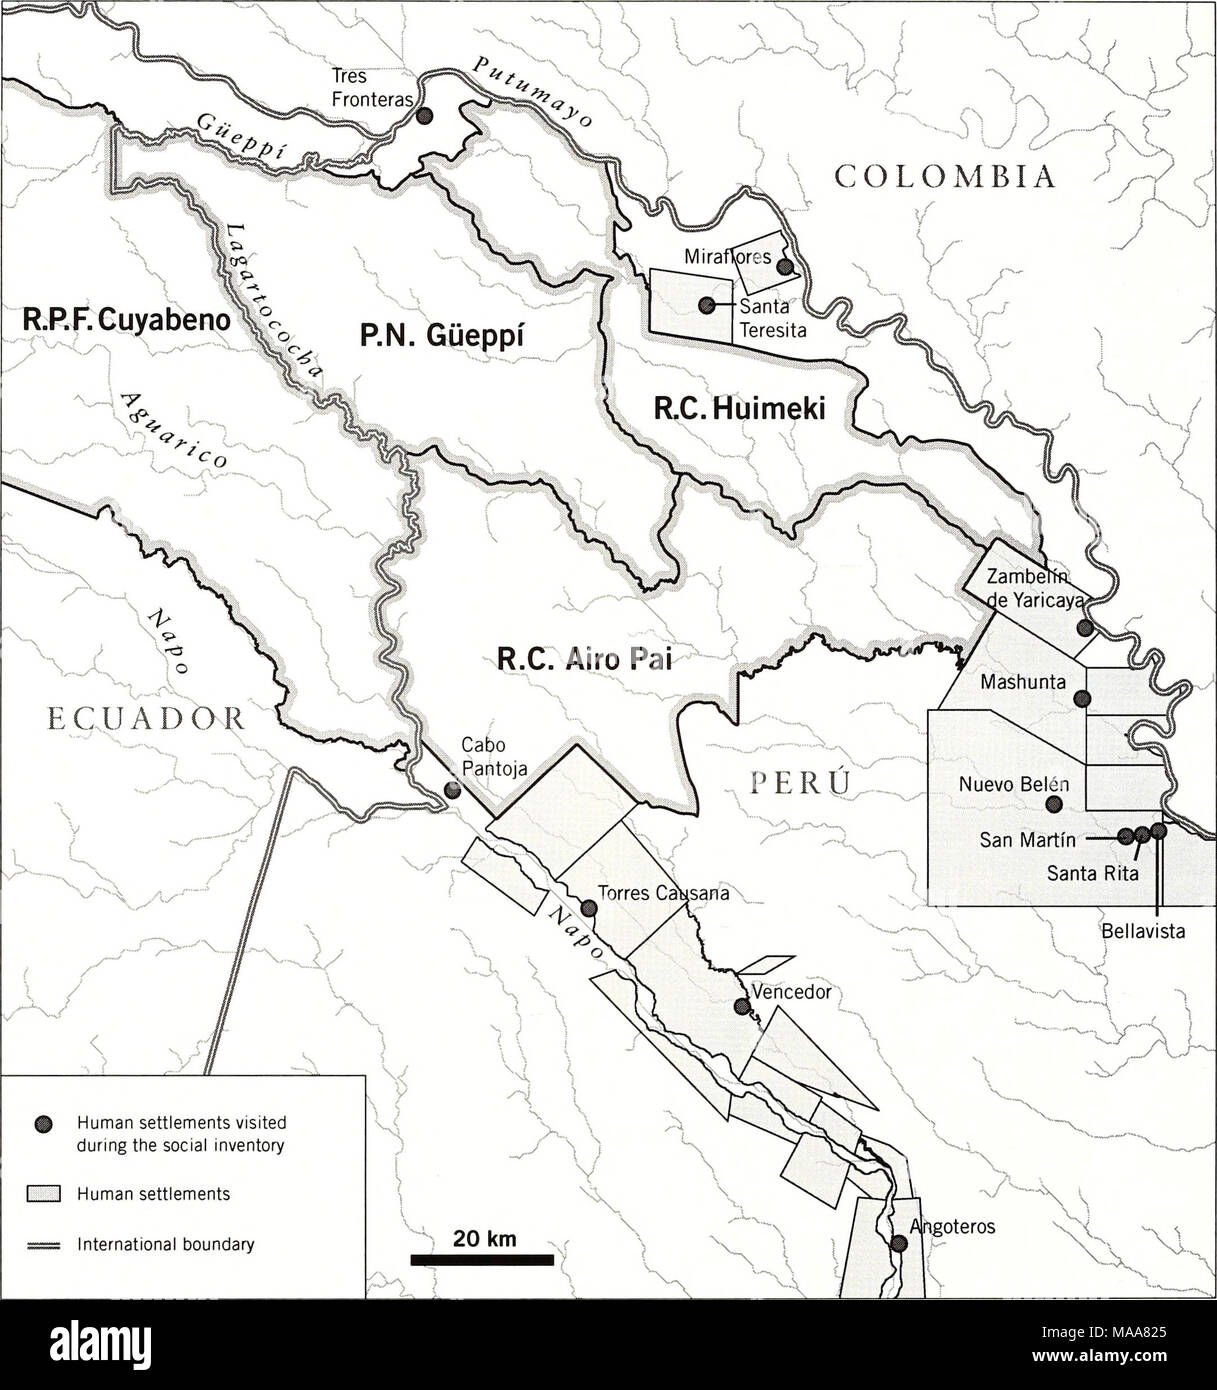 . Ecuador, Perú : Cuyabeno-Güeppí . 236 RAPID BIOLOGICAL AND SOCIAL INVENTORIES INFORME/REPORT NO. 20 - Stock Image